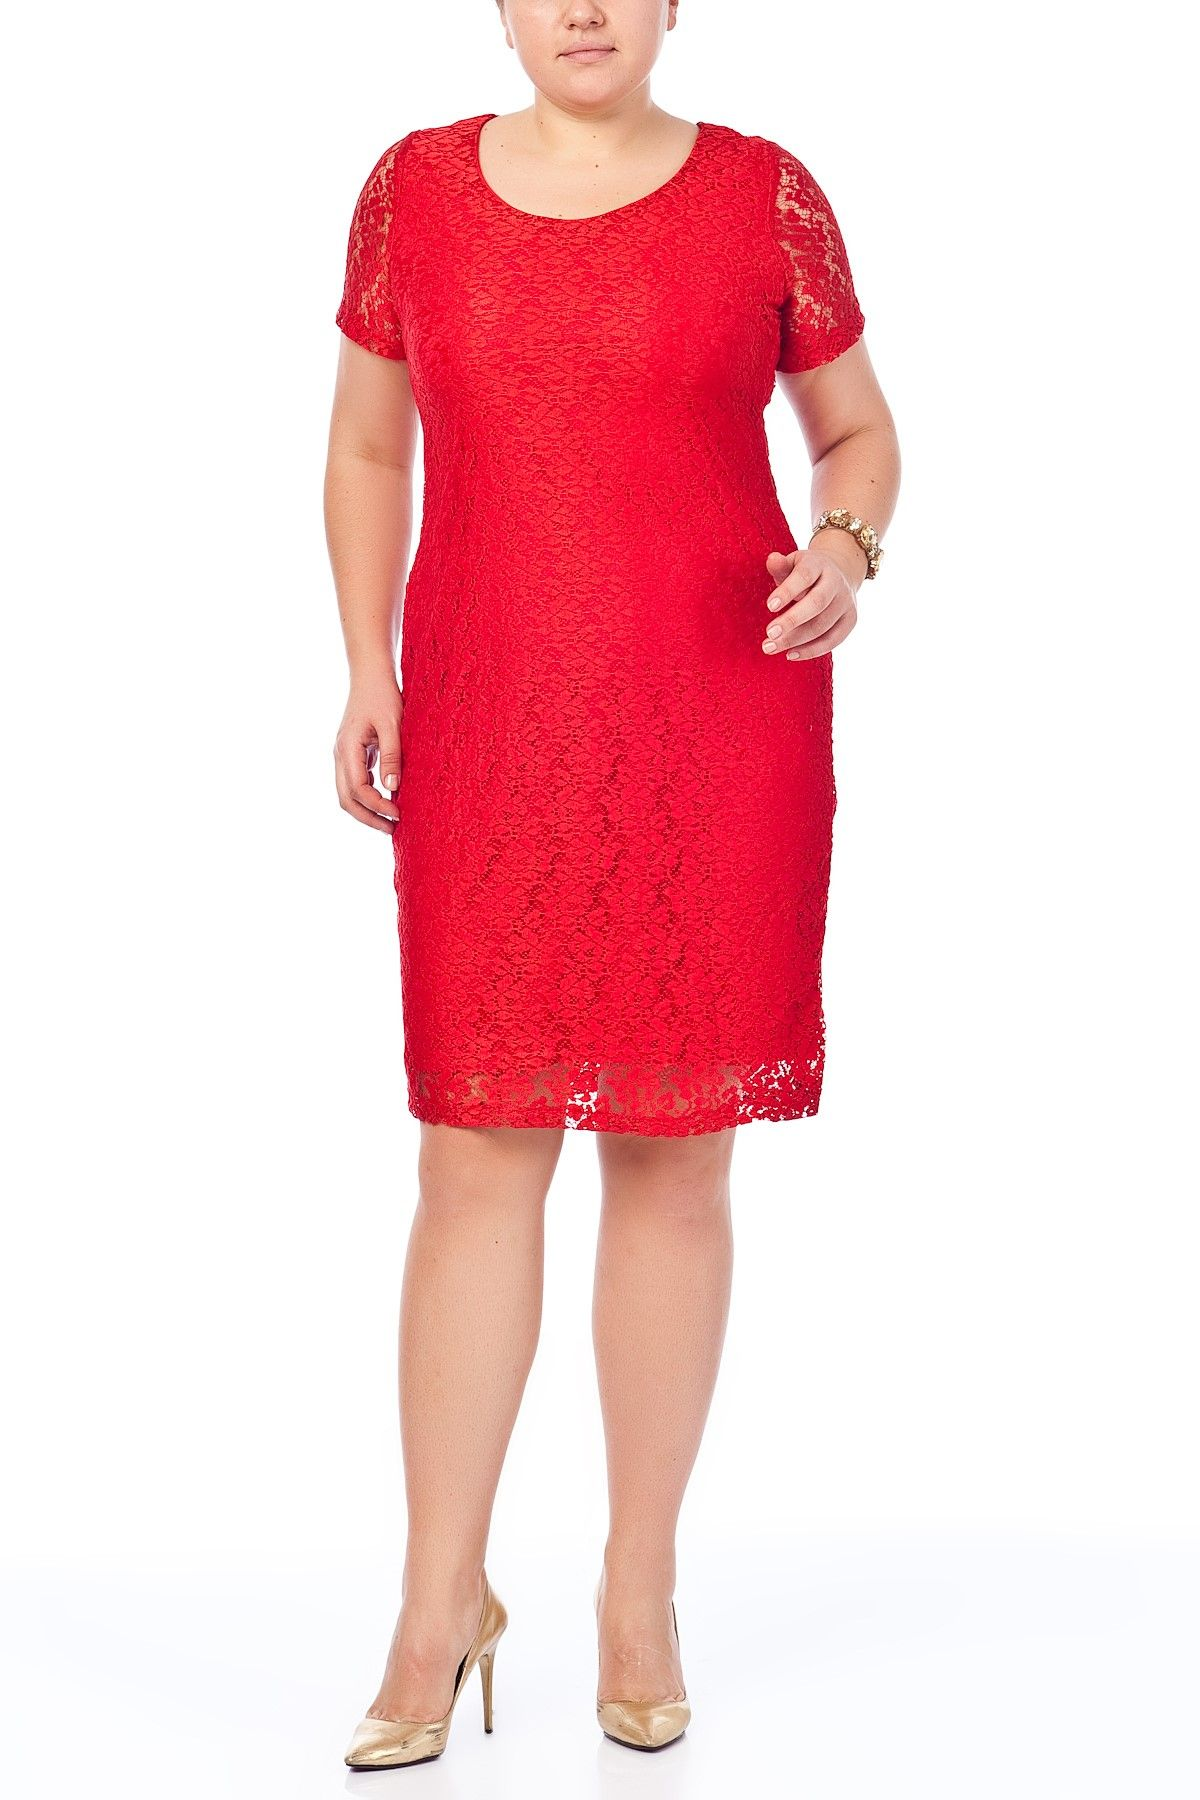 Buyuk Beden Kirmizi Elbise 65n2015 Elbise The Dress Elbiseler